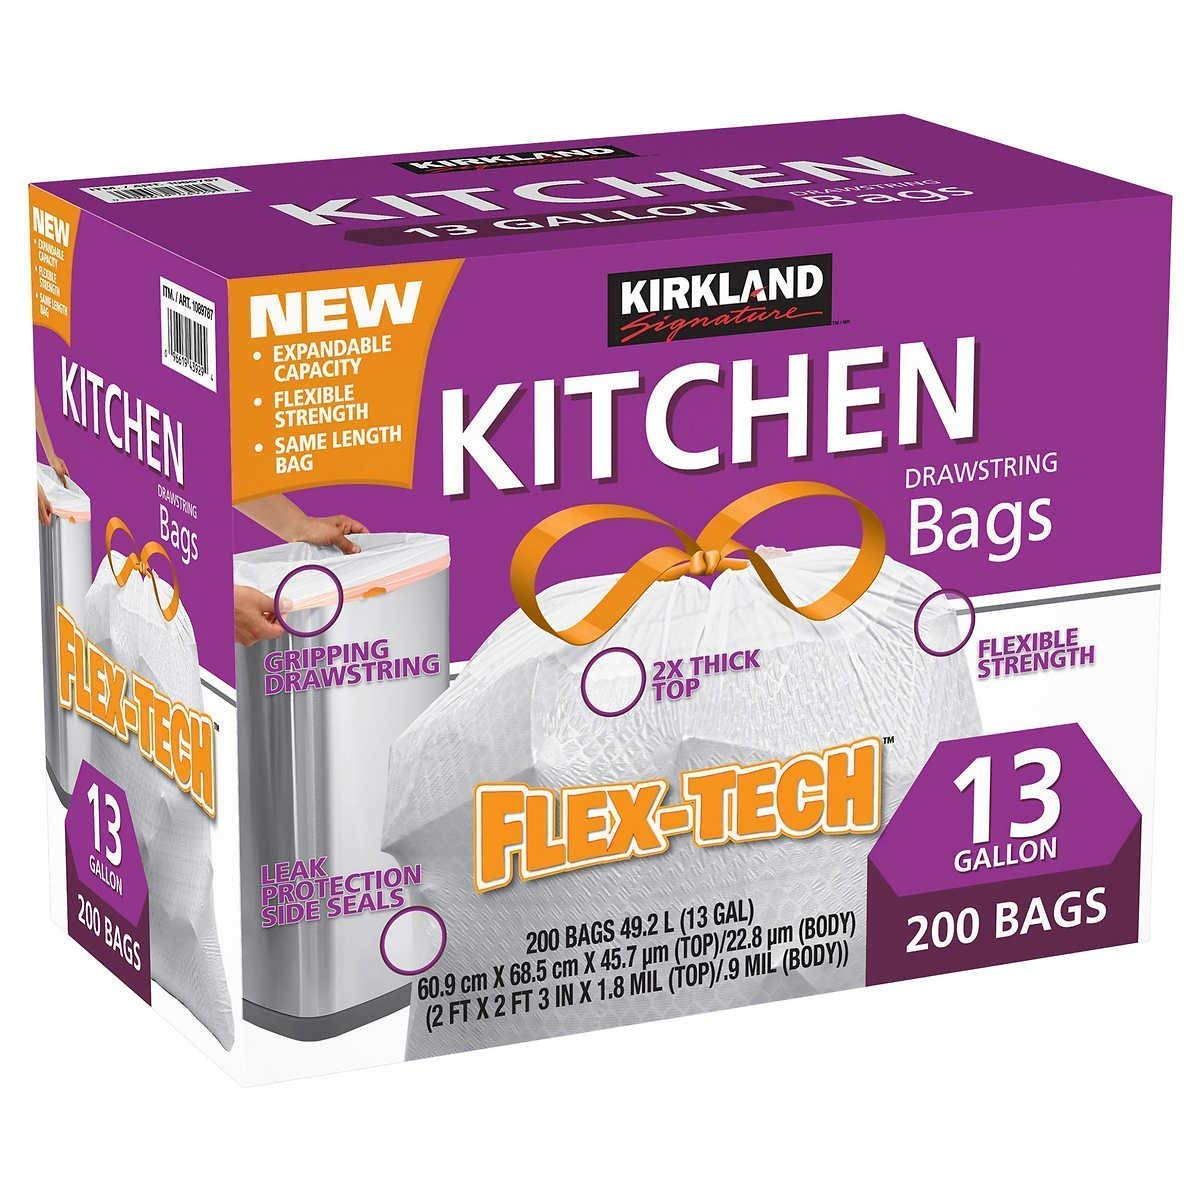 Kirkland Signature kli Drawstring Kitchen Trash Bags - 13 Gallon - 200 Count (.4 Pack) by Kirkland Signature (Image #1)